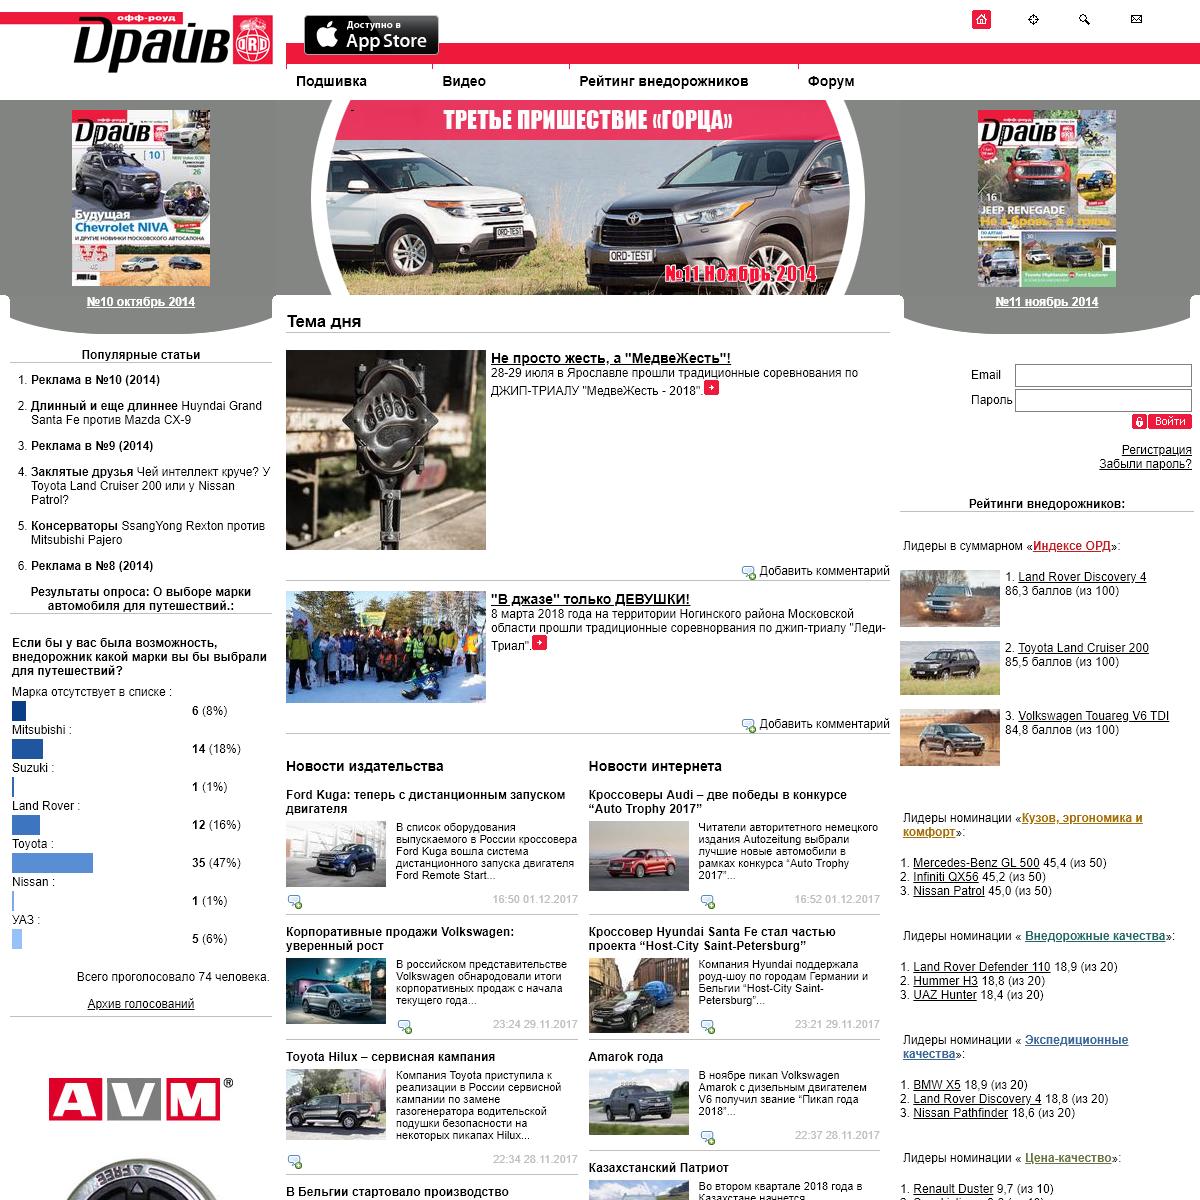 Журнал о полноприводной технике формата 4х4 - Off-road drive